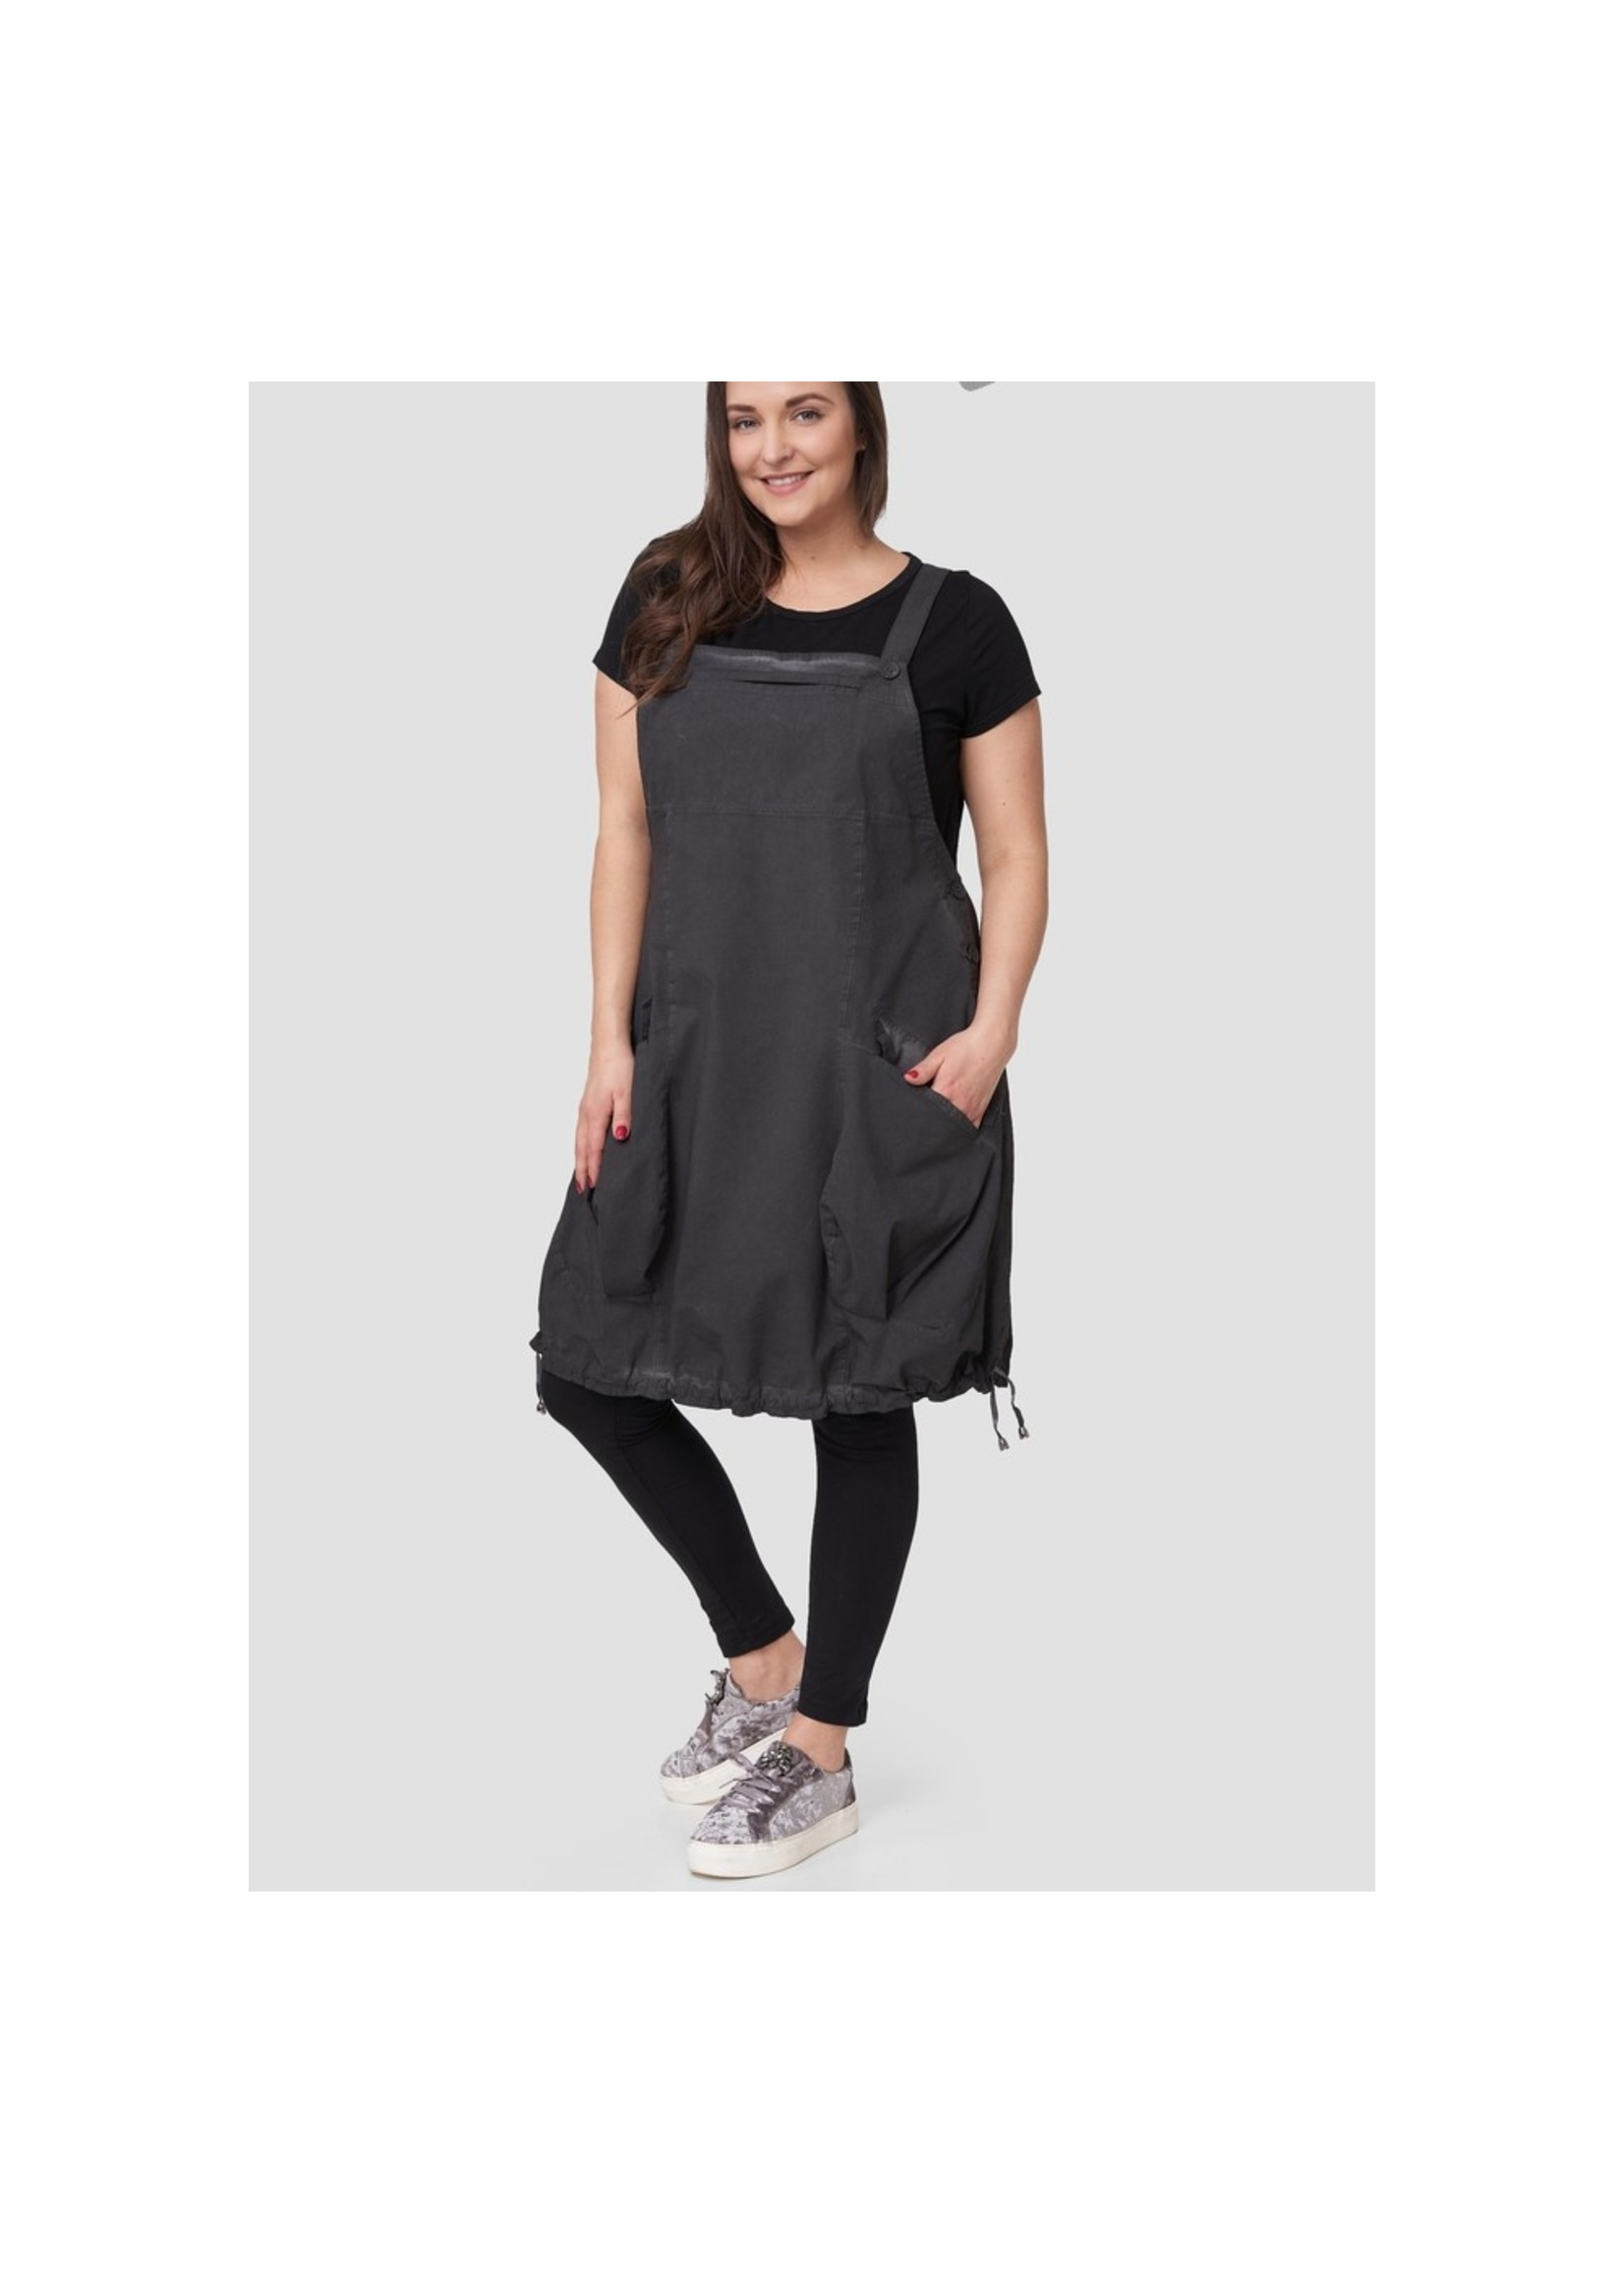 KEKOO 1307234 dress